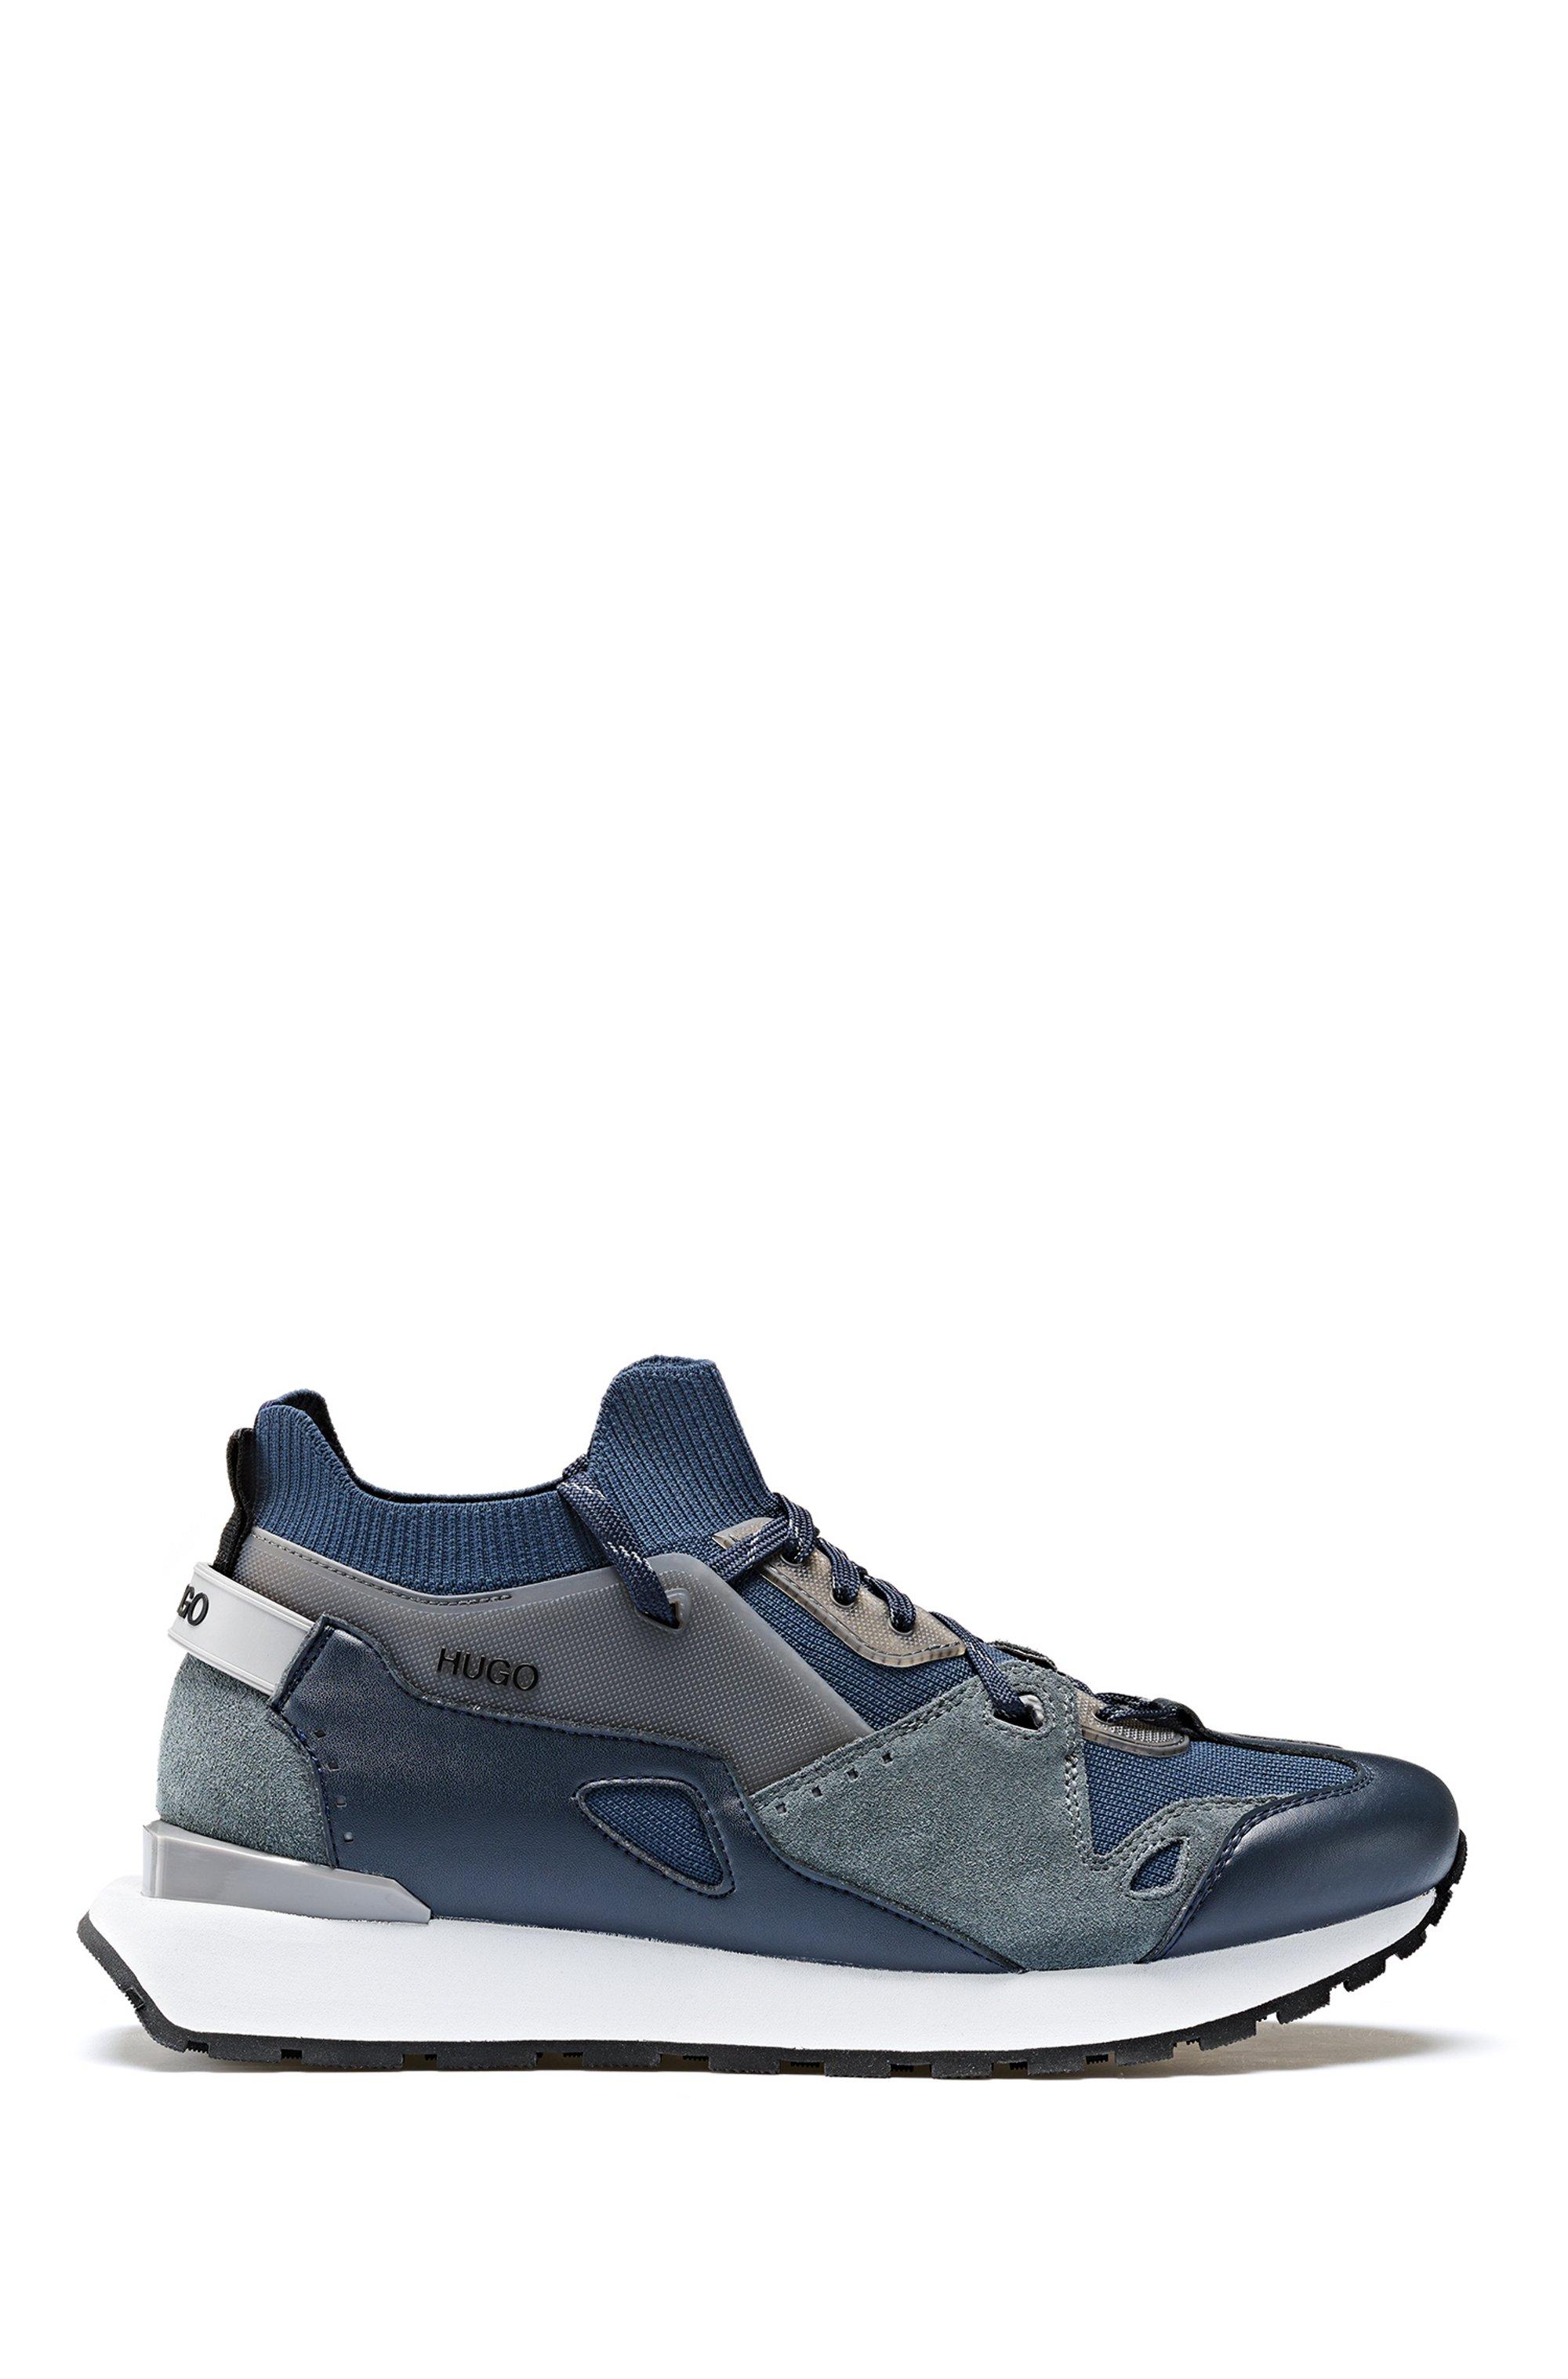 Sock-Sneakers im Retro-Look mit Veloursleder- und Mesh-Details, Blau